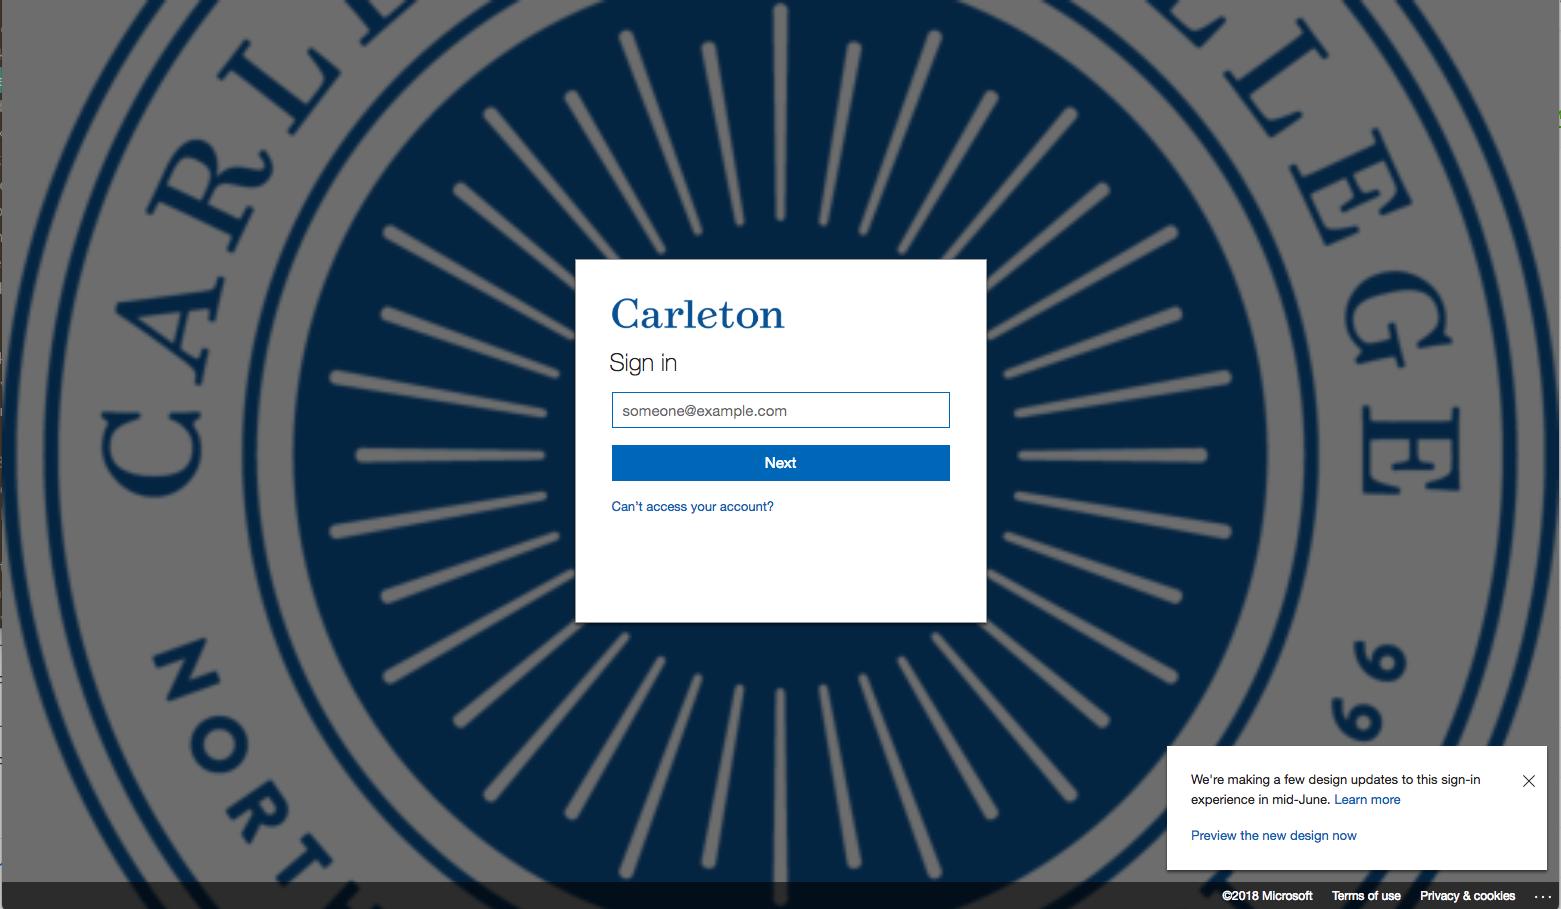 Power BI What Did I Teach? Report - ITS - Carlpedia